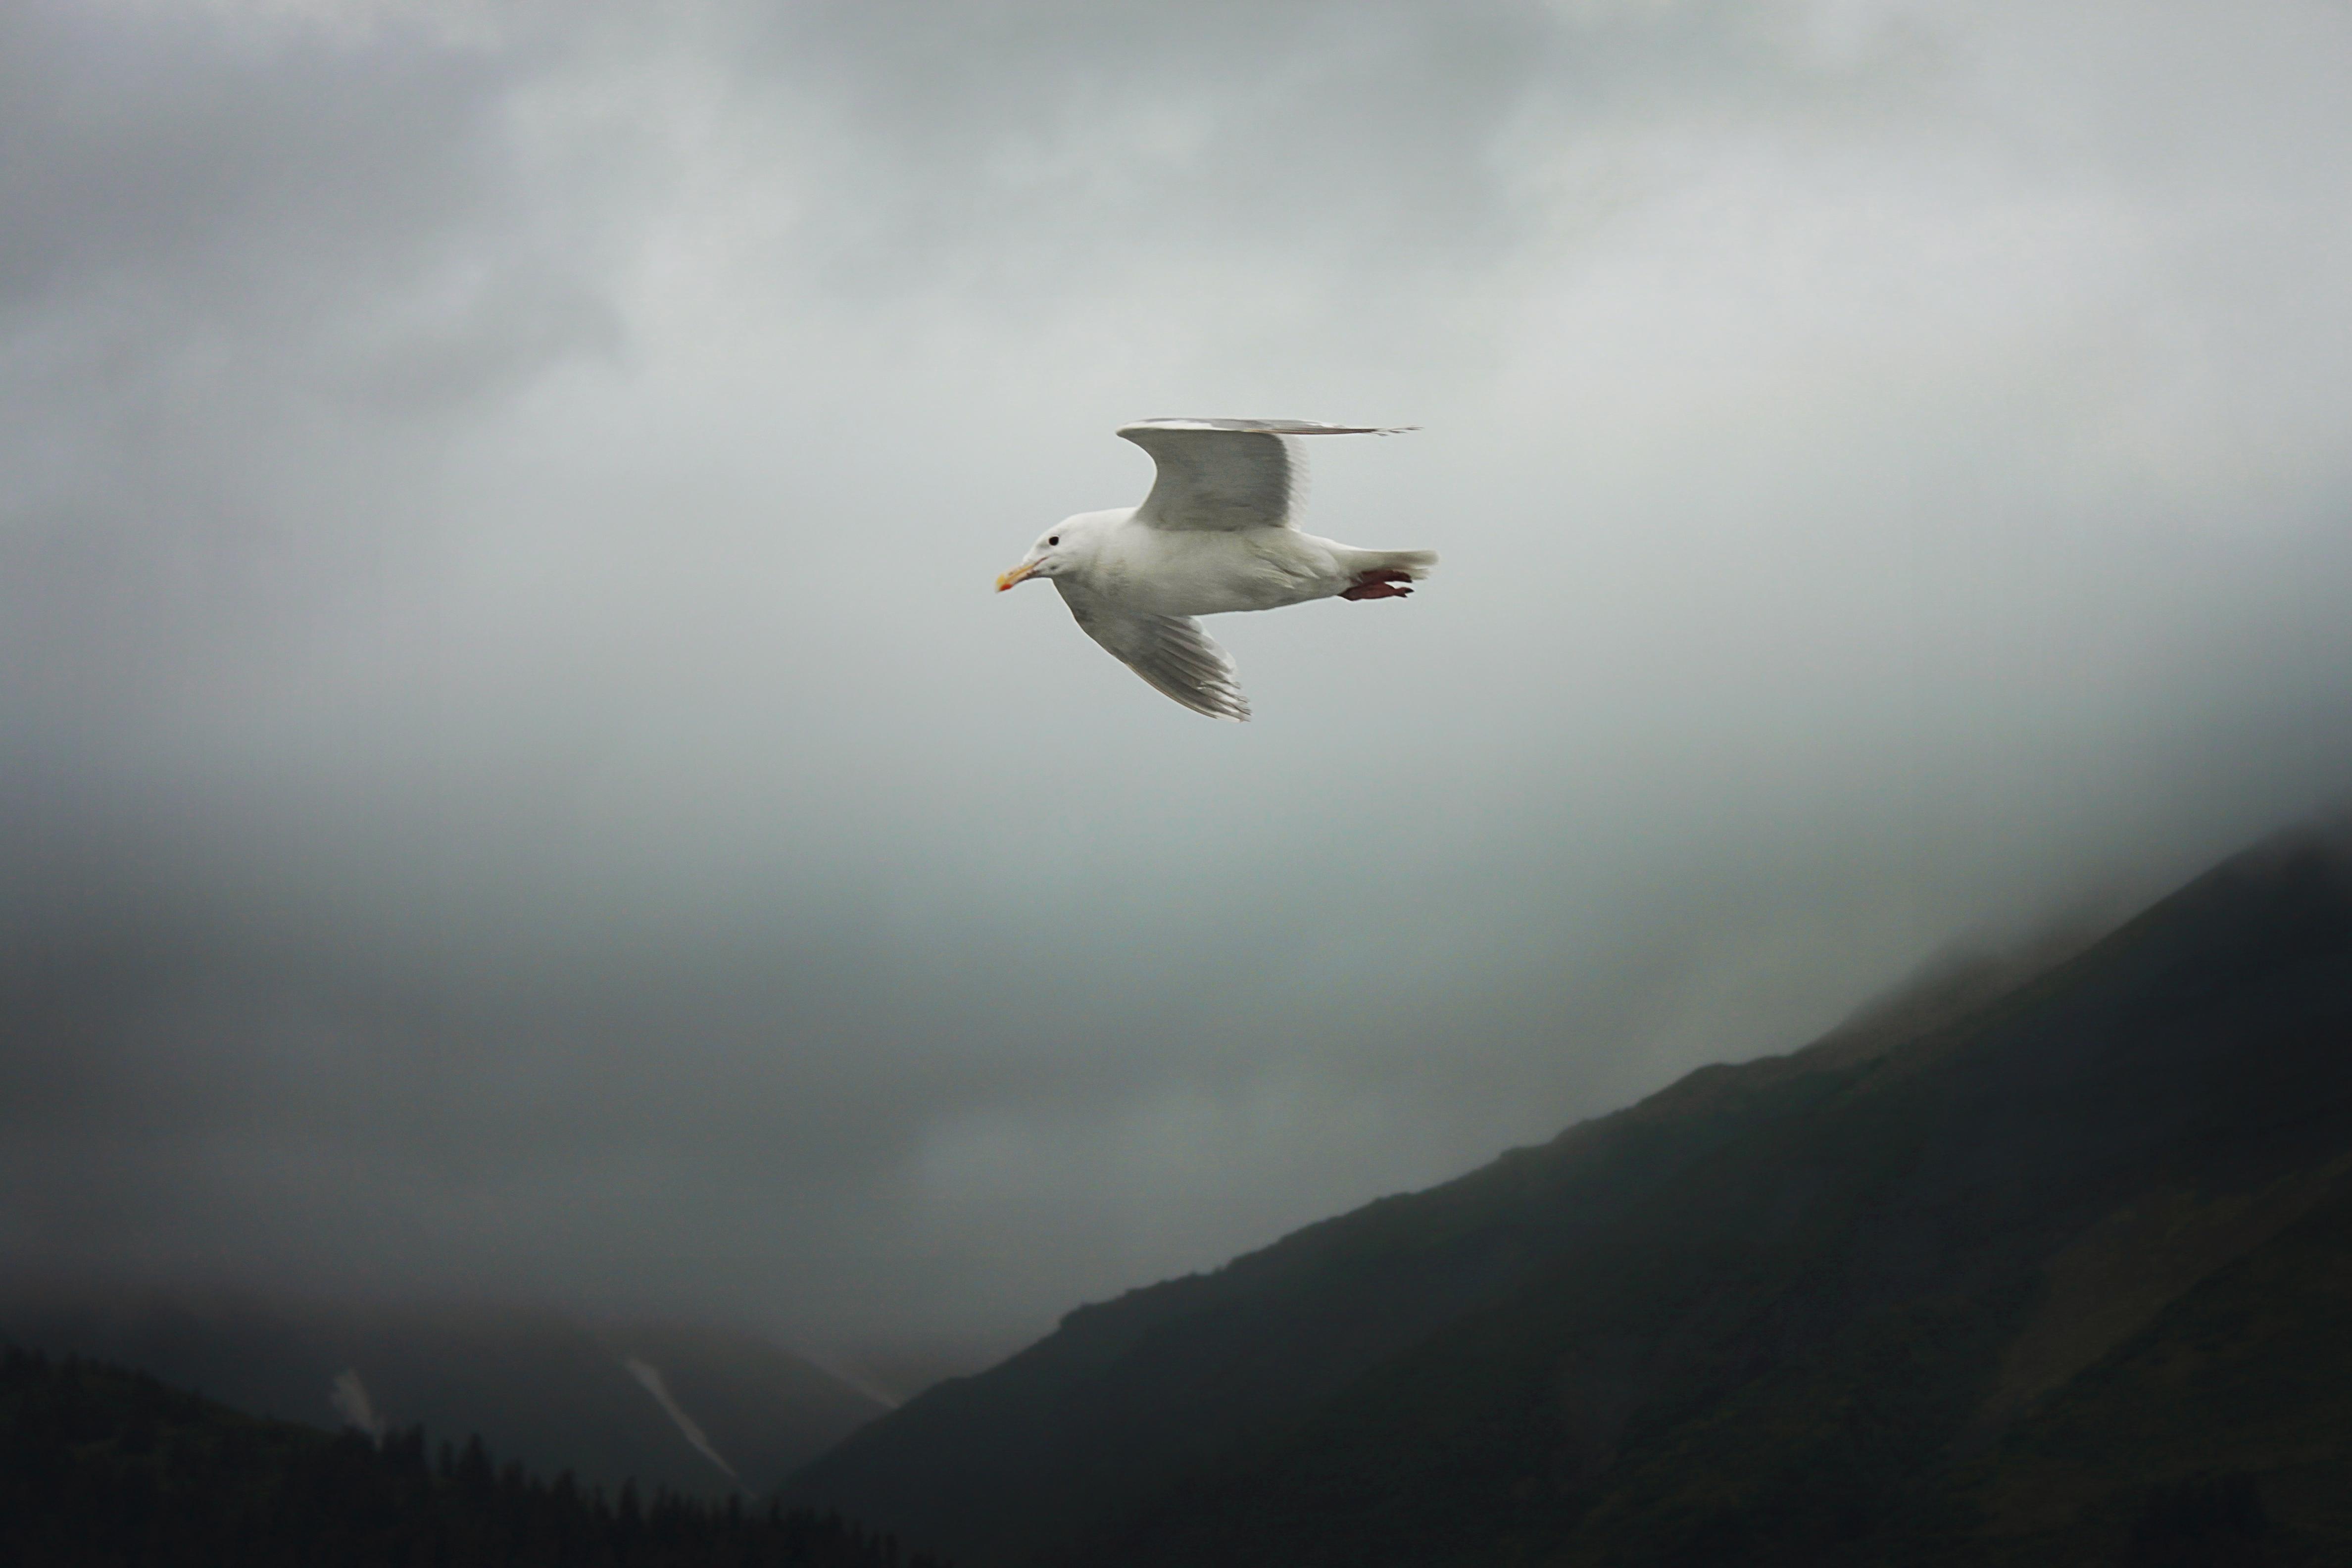 flyingbird.jpg